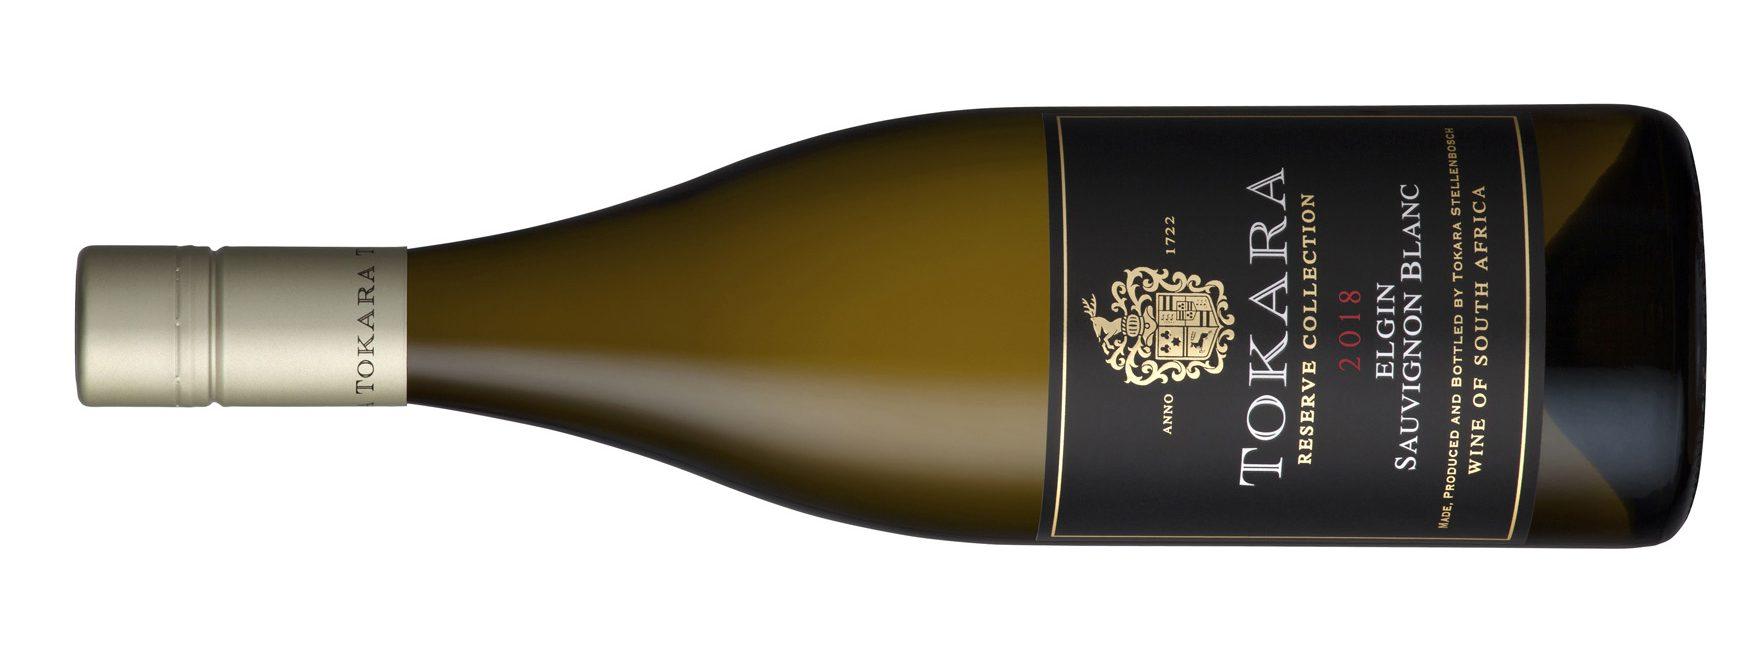 Tokara Reserve Collection Elgin Sauvignon Blanc 2018 LR e1541130140644 New TOKARA winemaker has his sights on Sauvignon Blanc